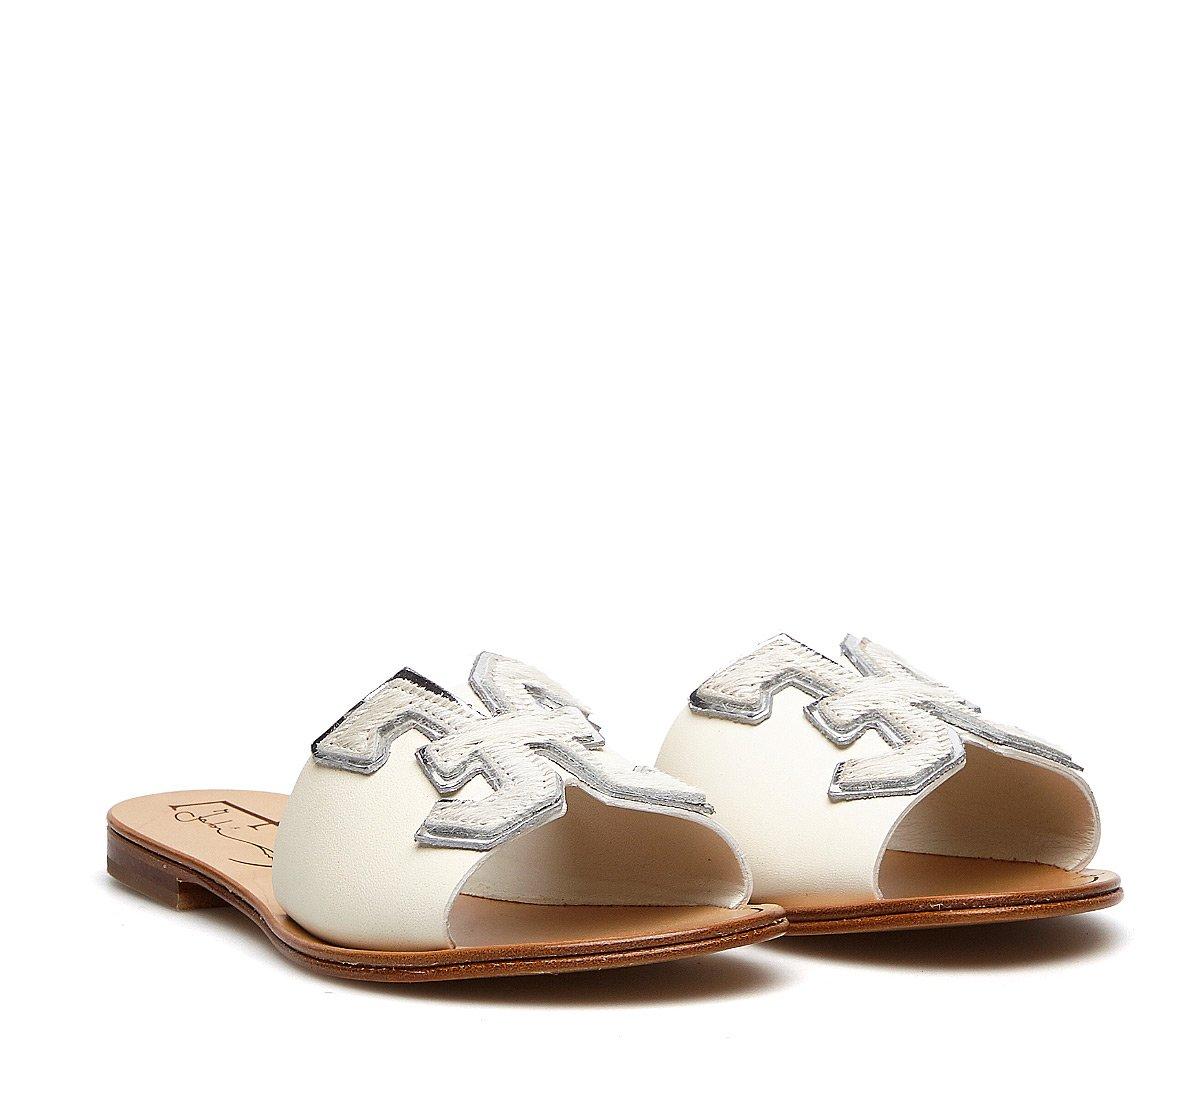 Soft calfskin slip-ons